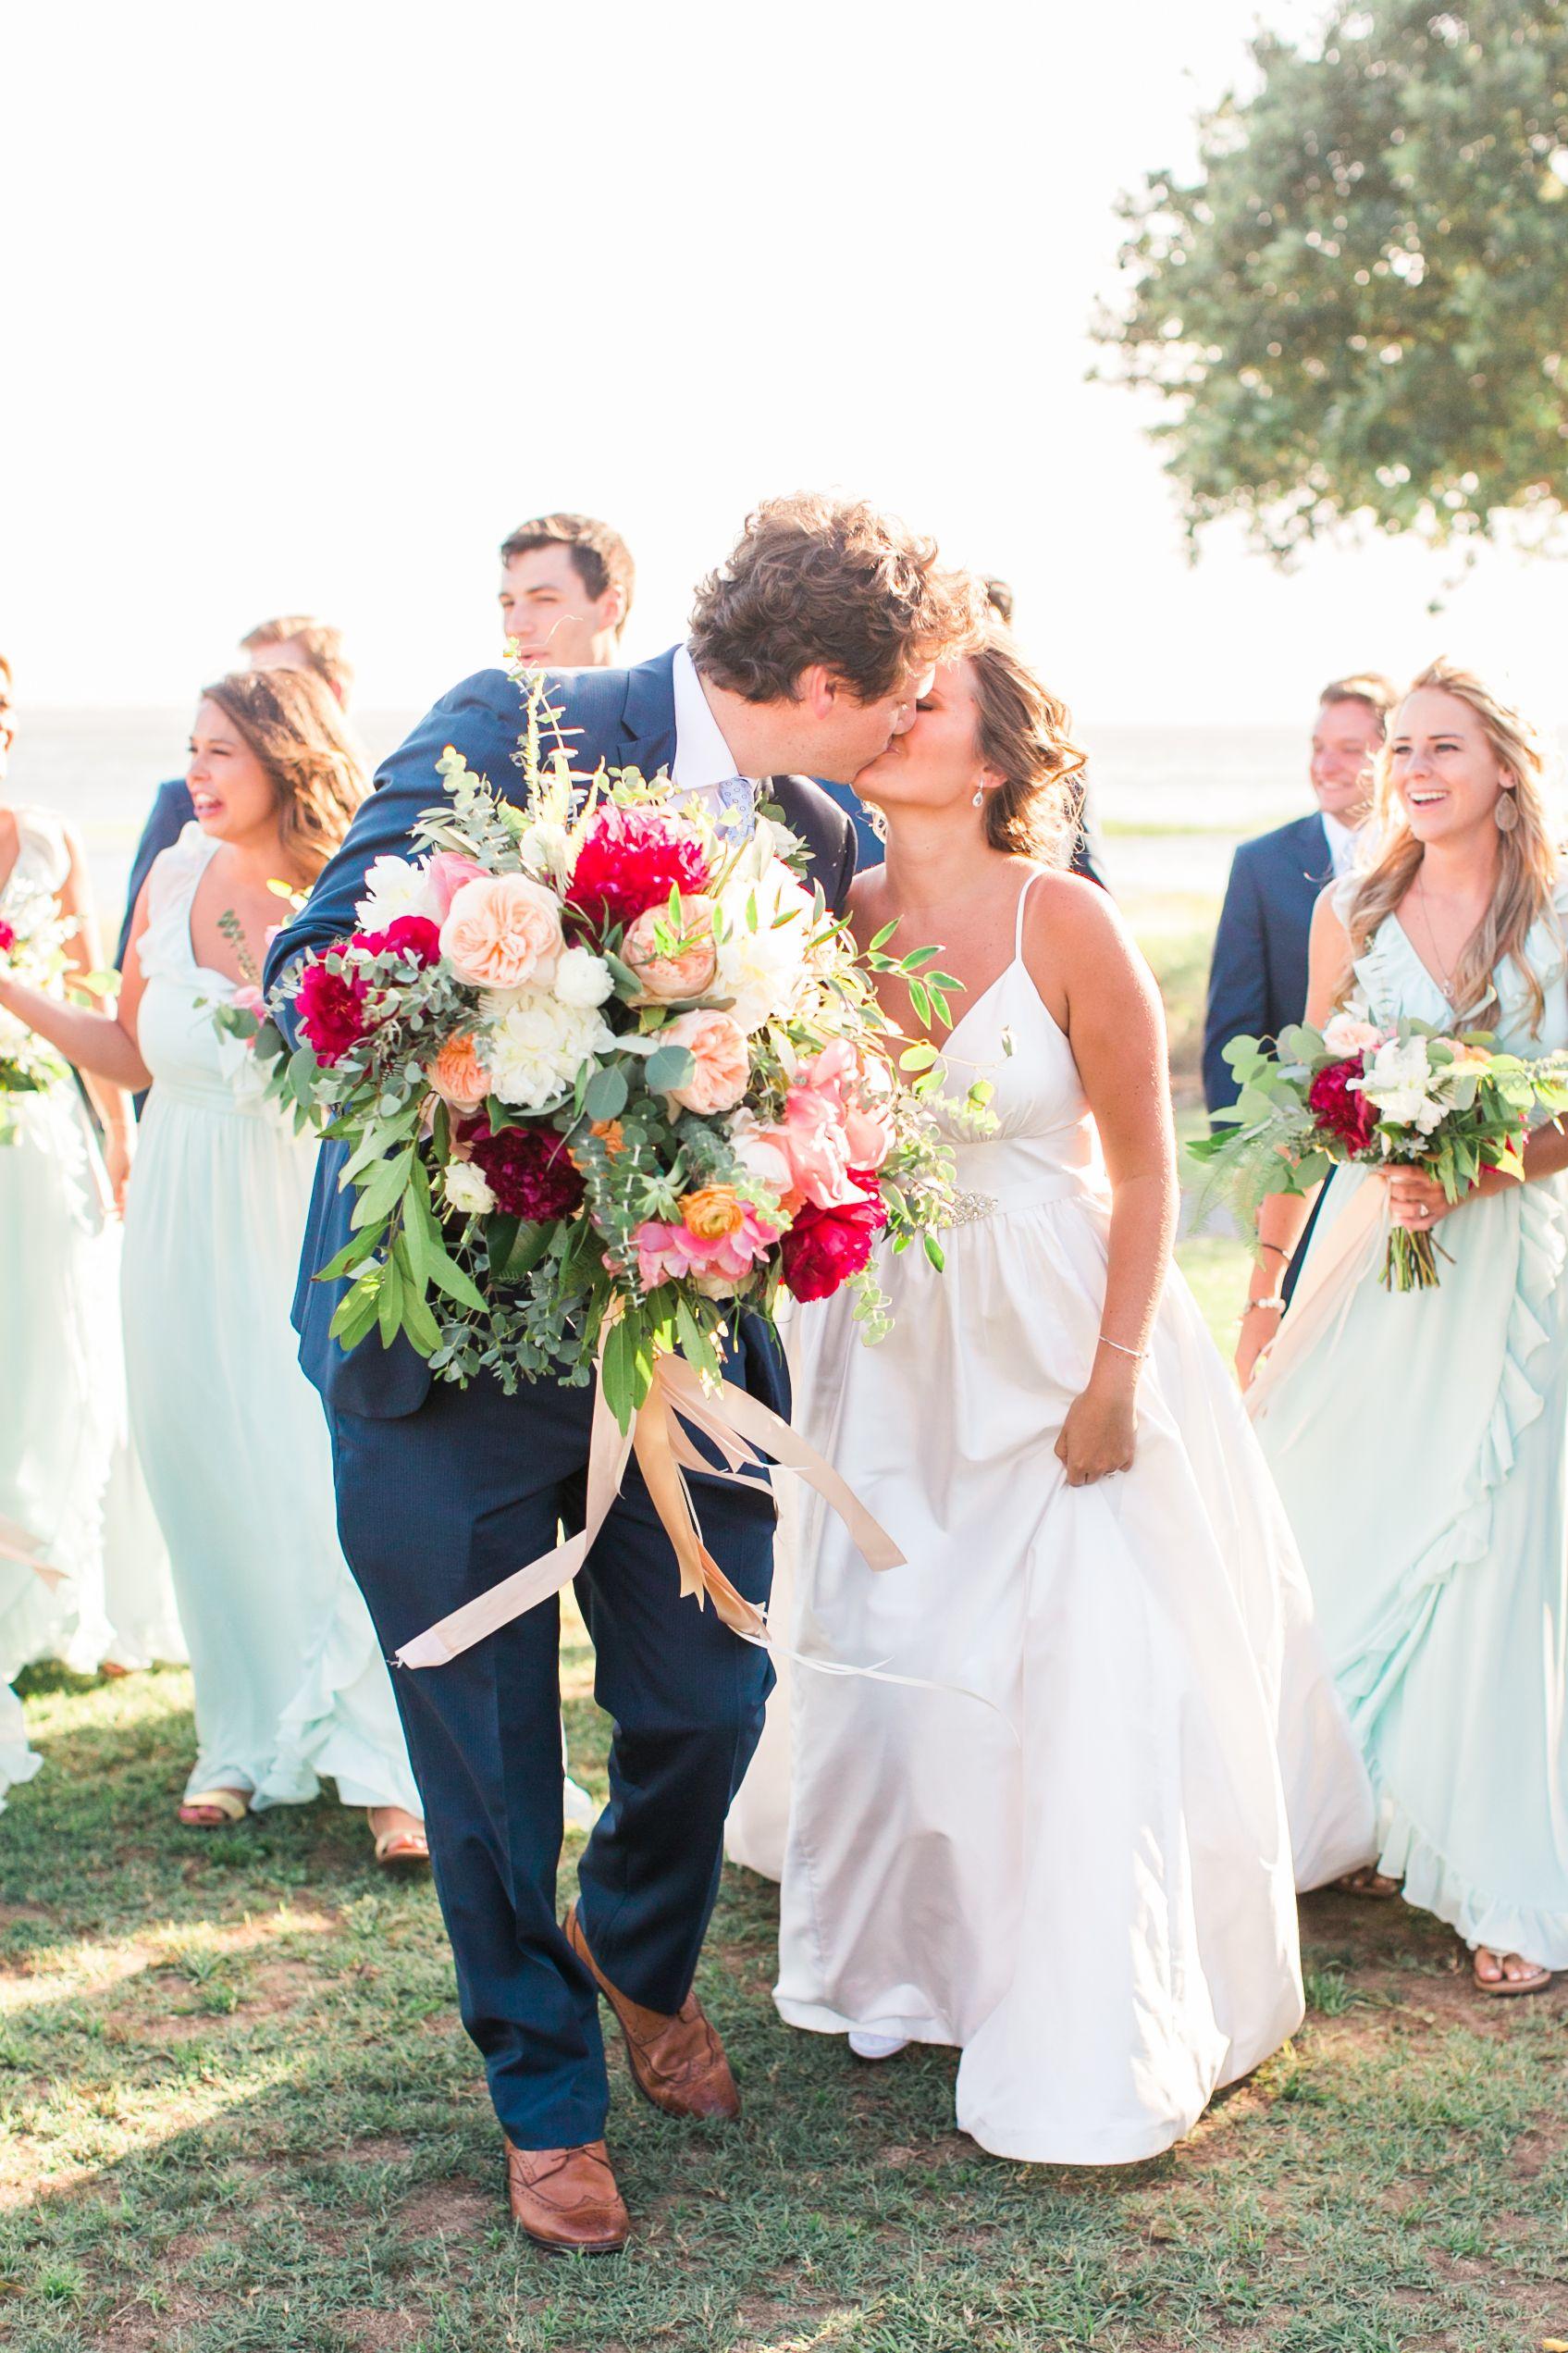 Jessi Nichols Photography   Greenville SC Based Wedding Photographer ...